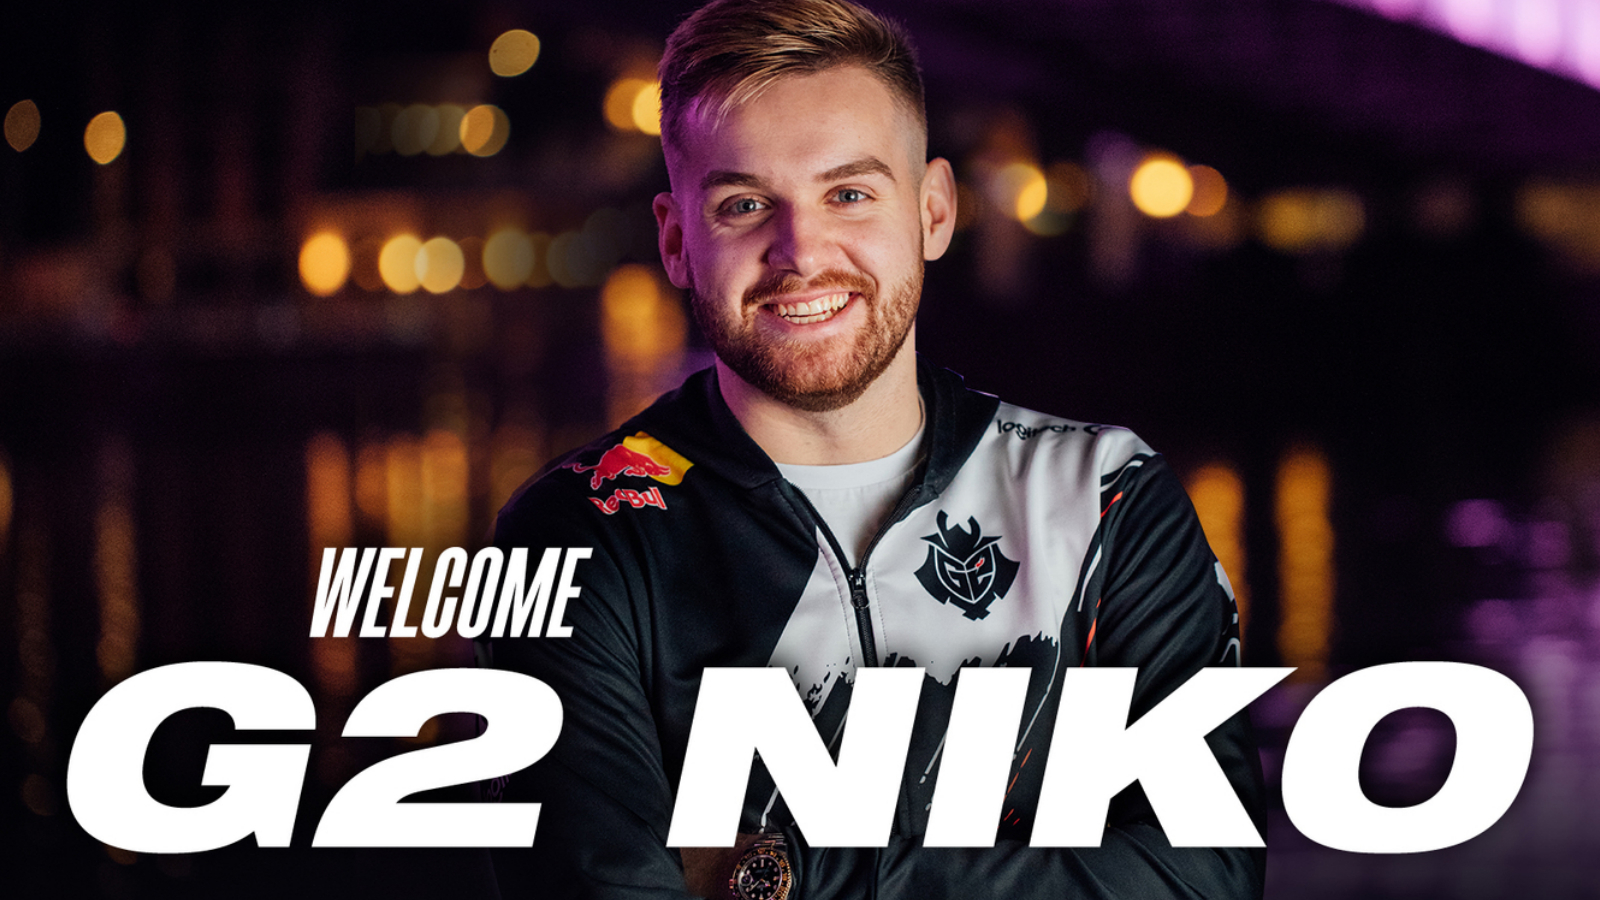 G2 NiKo announcement